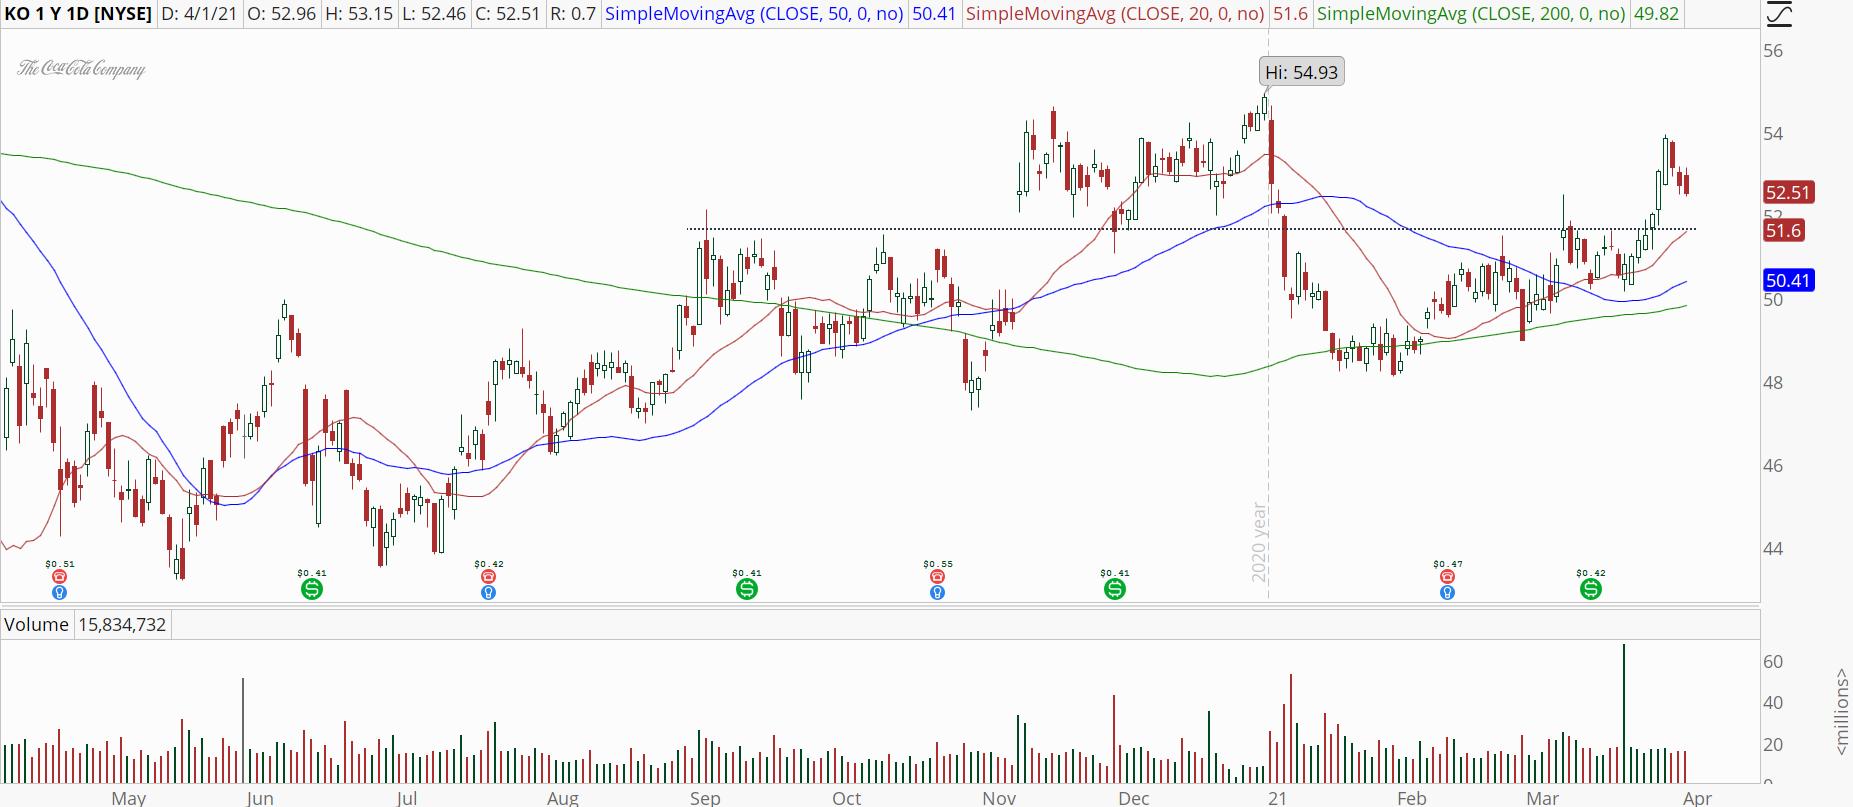 Coca-Cola (KO) stock with bull retracement